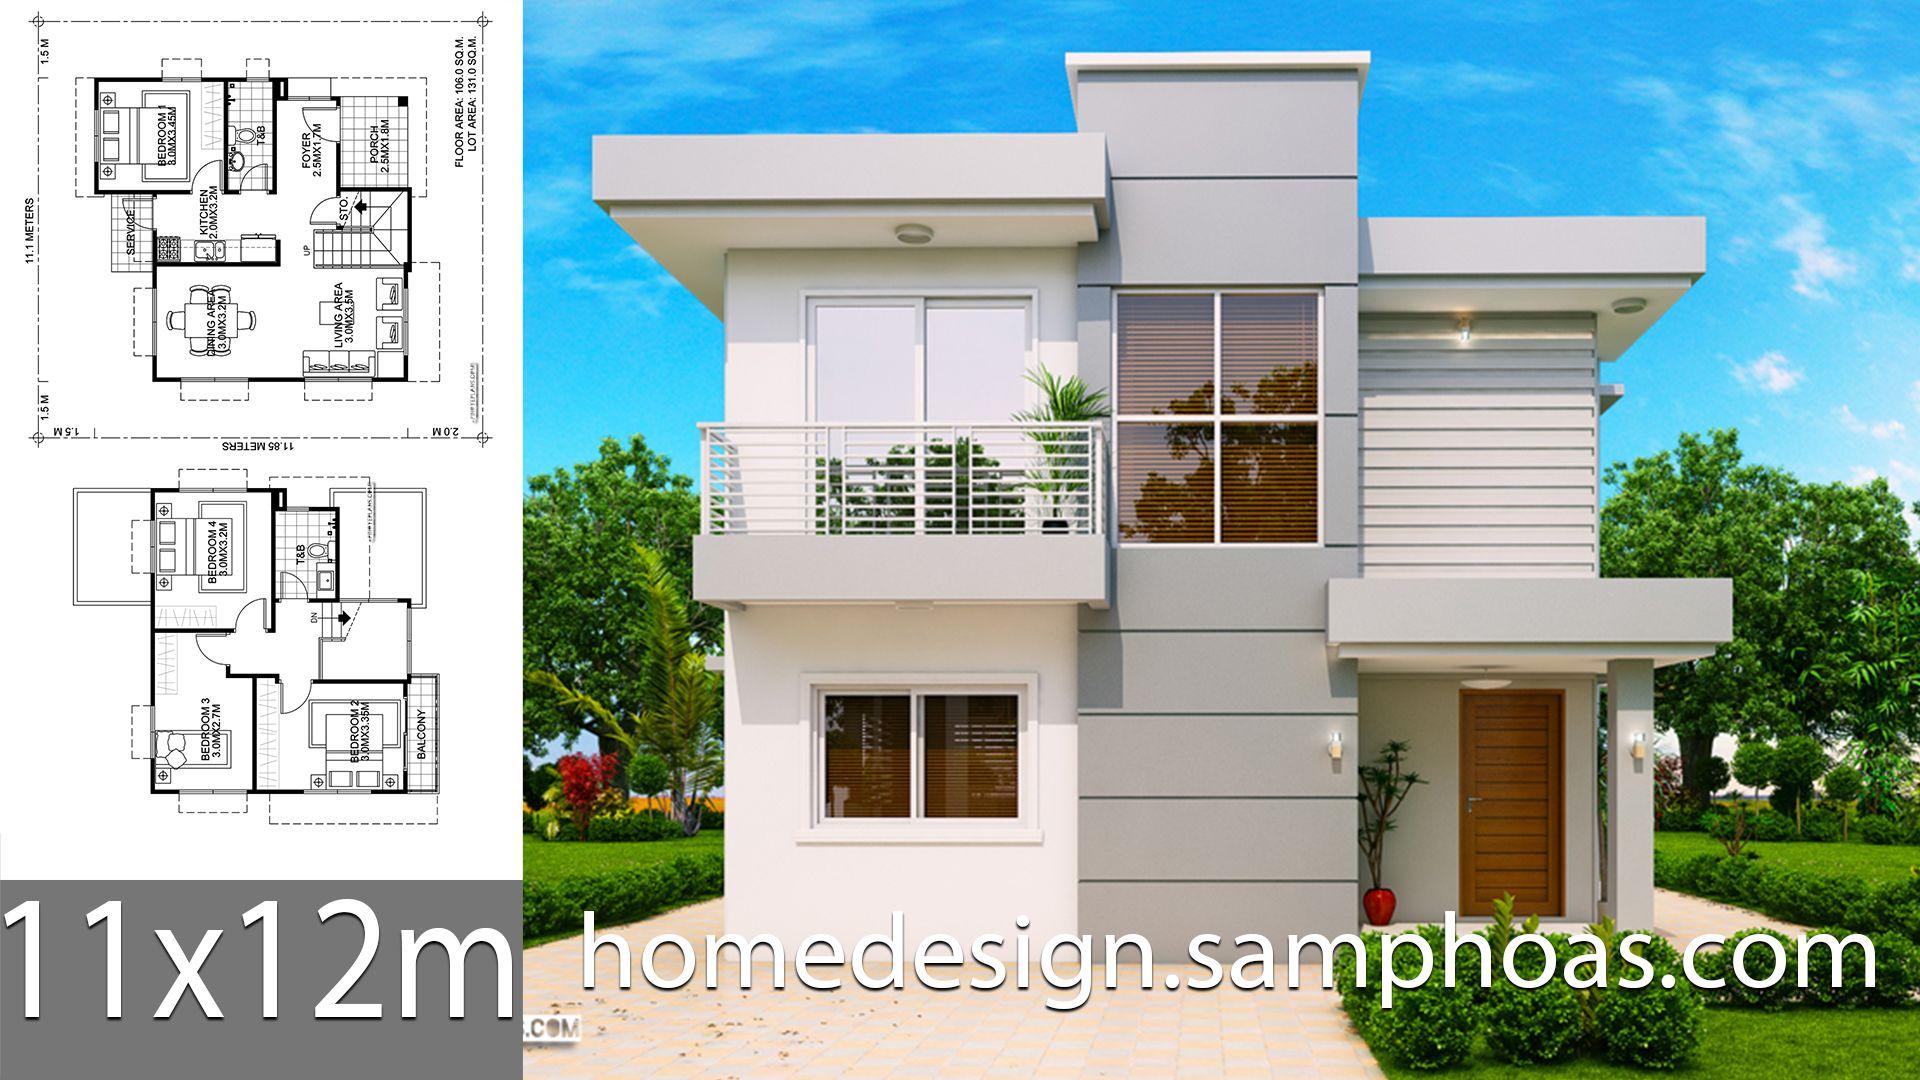 House Design Plans 11x12m With 4 Bedrooms Style Modern Terrace Slap House Description Ground Level 1 In 2020 House Design Home Design Plans House Architecture Design